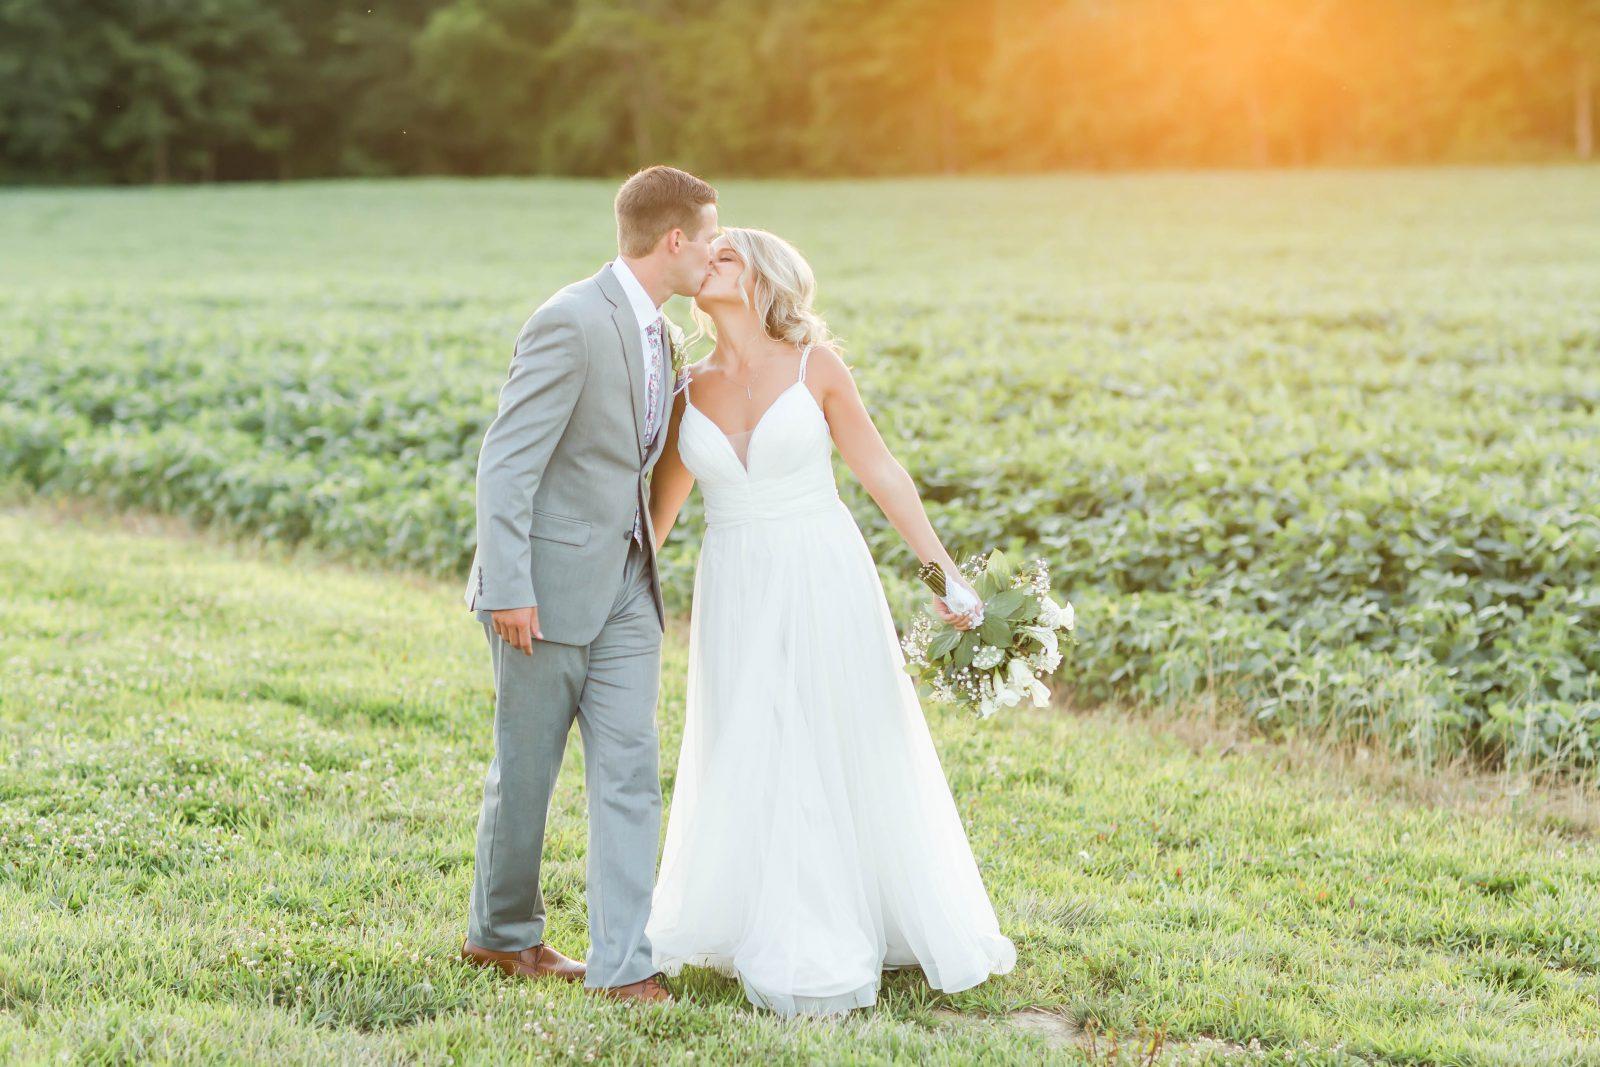 peacock-ridge-summer-wedding-photographer-akron-ohio-loren-jackson-photography-115